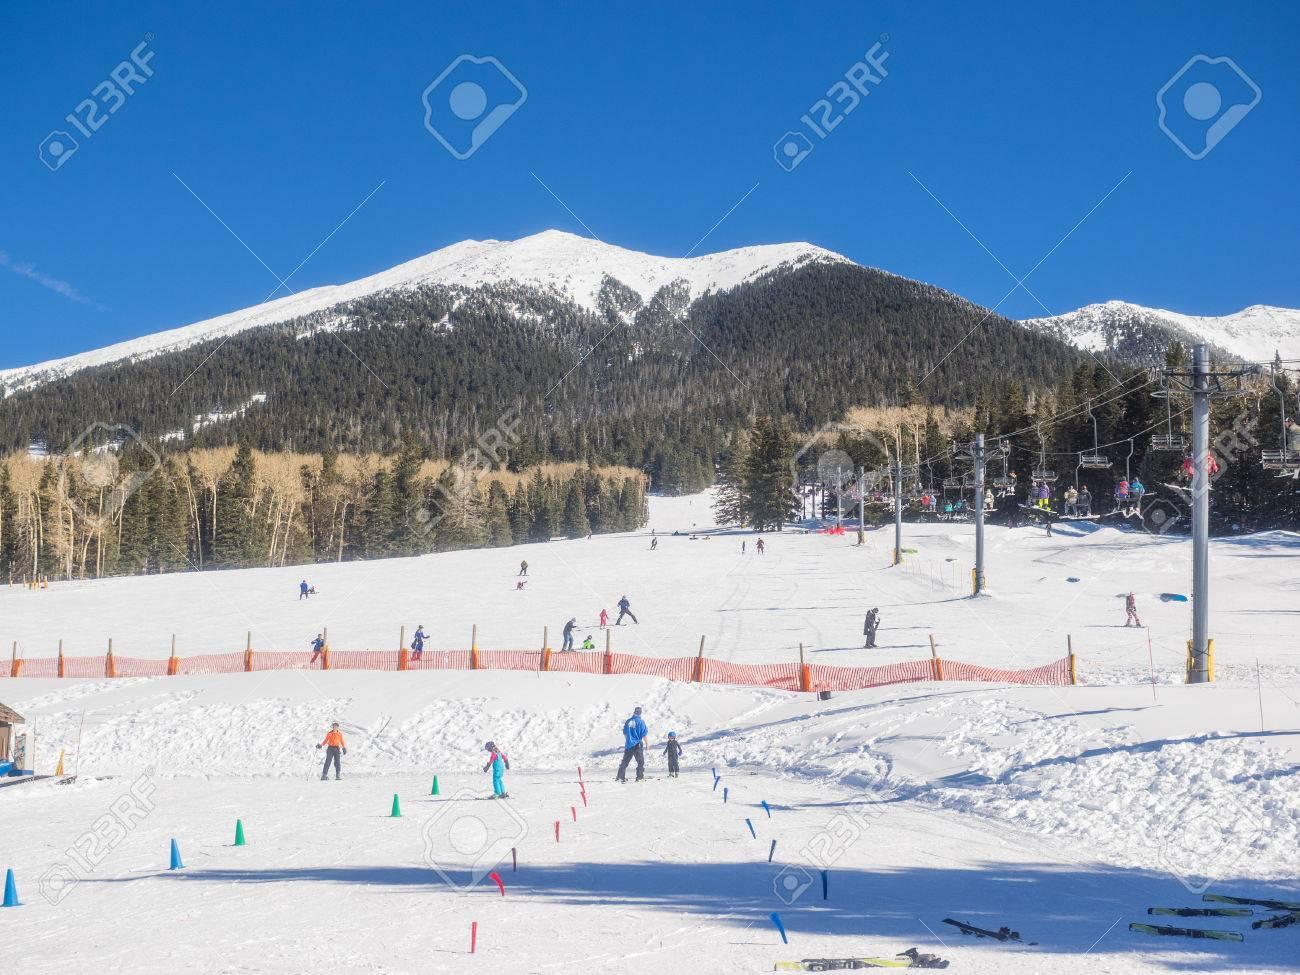 arizona snowbowl is an alpine ski resort located on the san